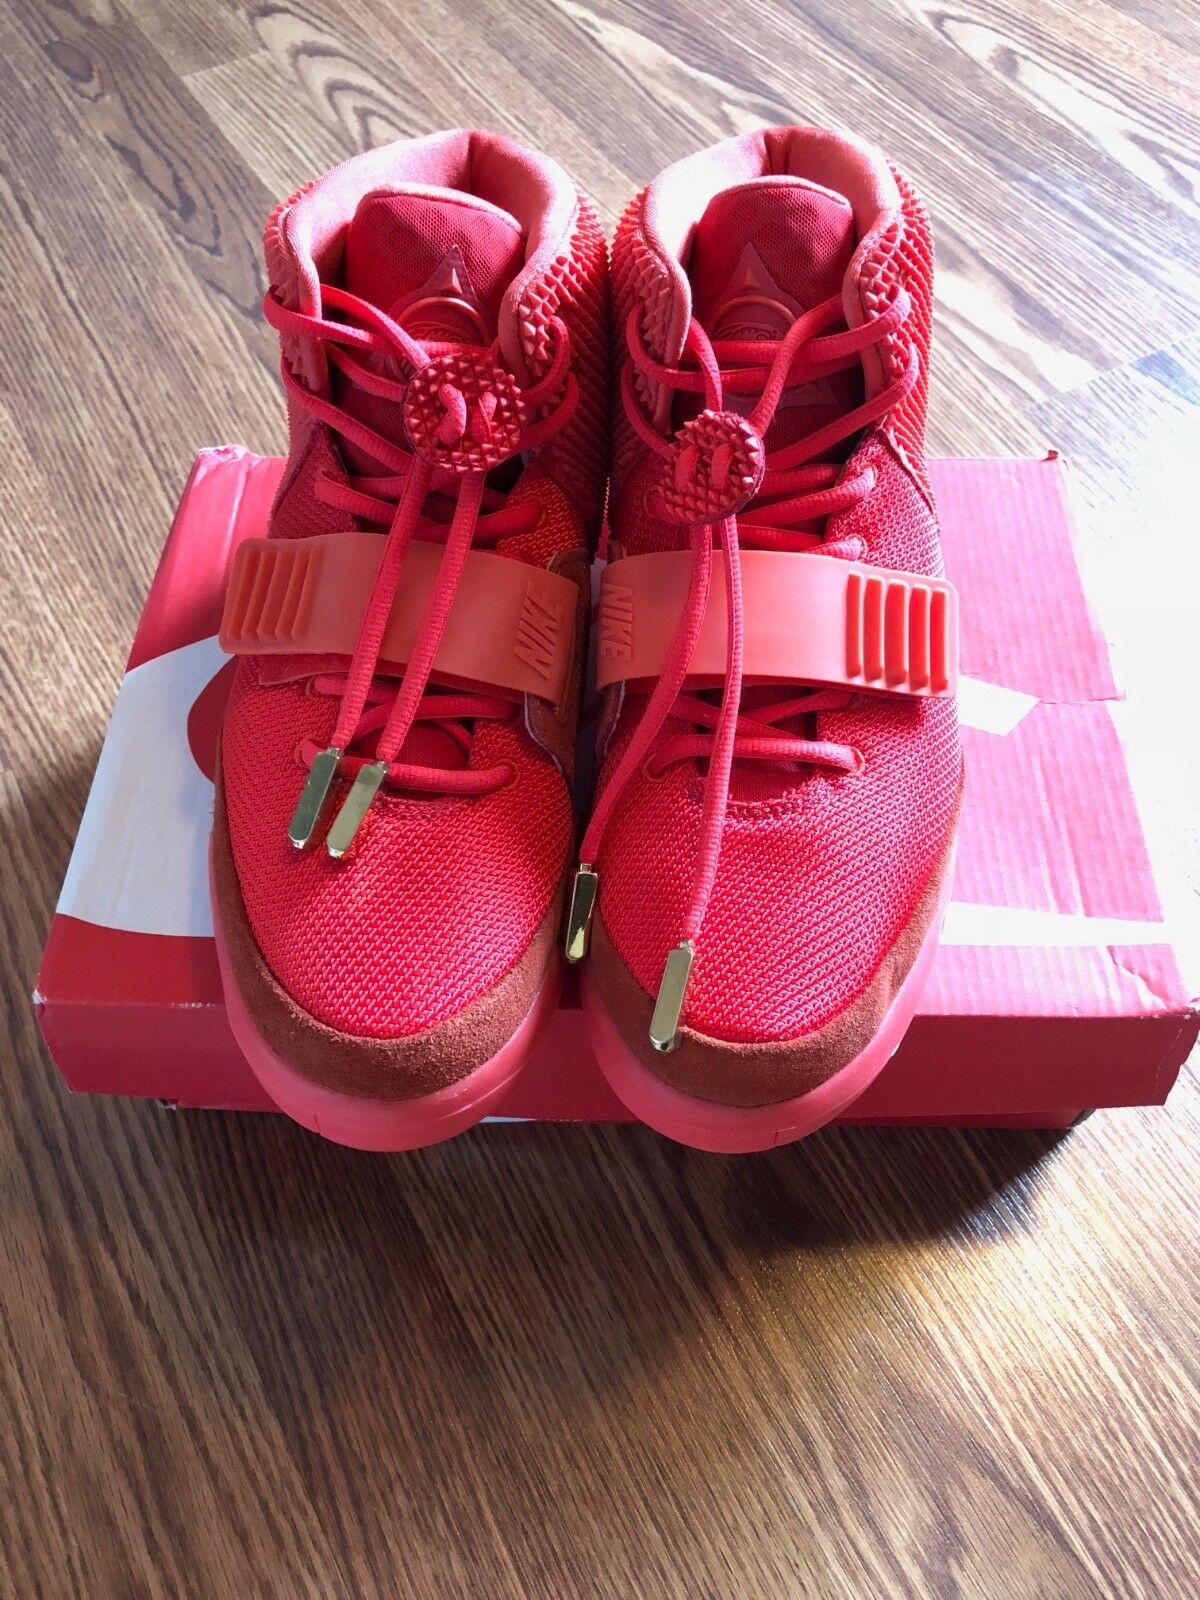 Nike air yeezy 2 ottobre rosso sz us9 uk8 kanye west 508214-660